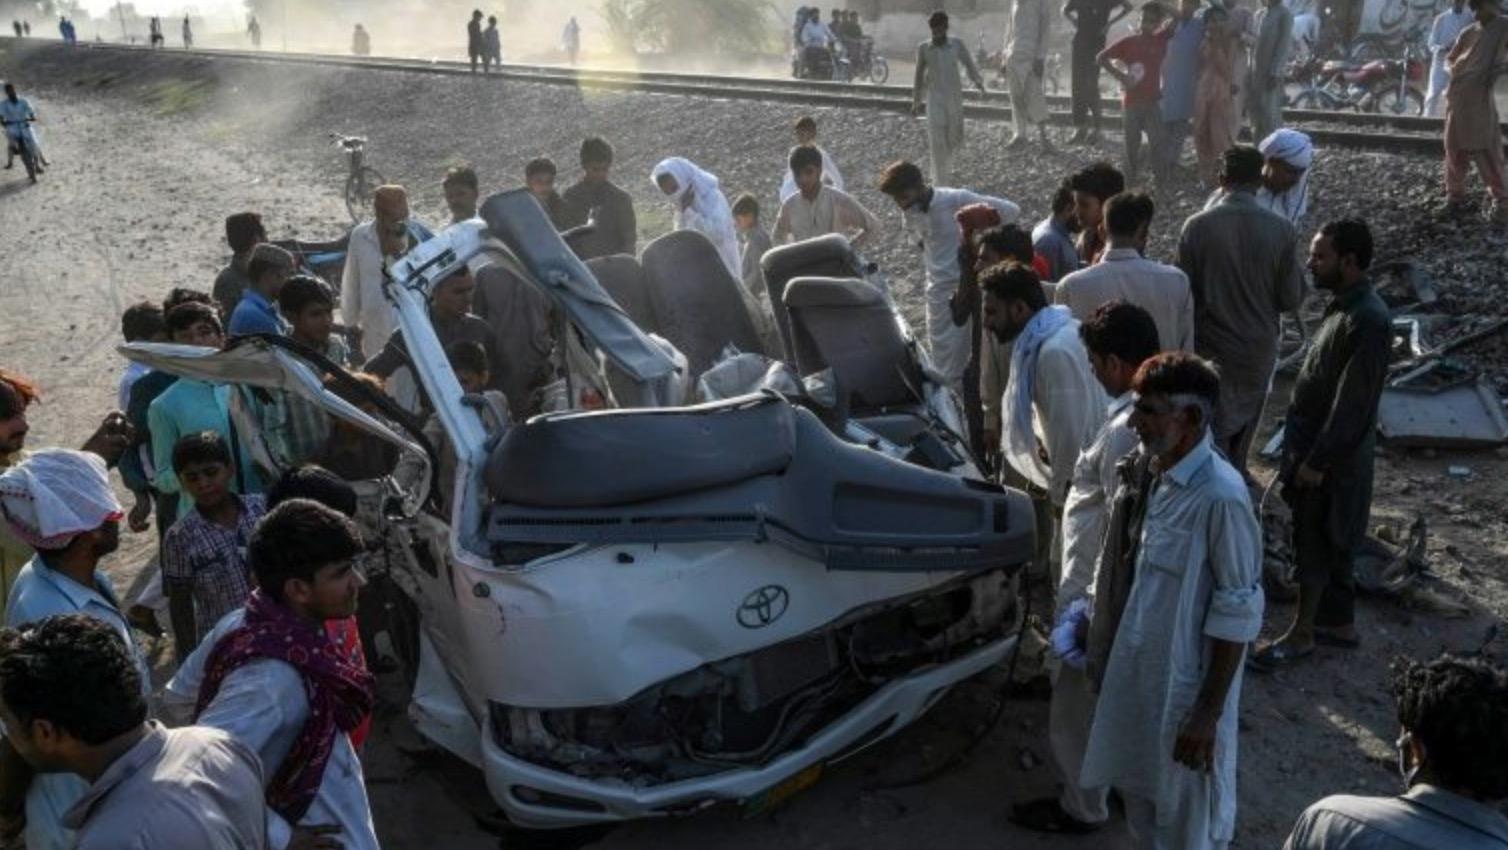 Pakistan Train and Van Collided Leaving 19 Pilgrims Dead